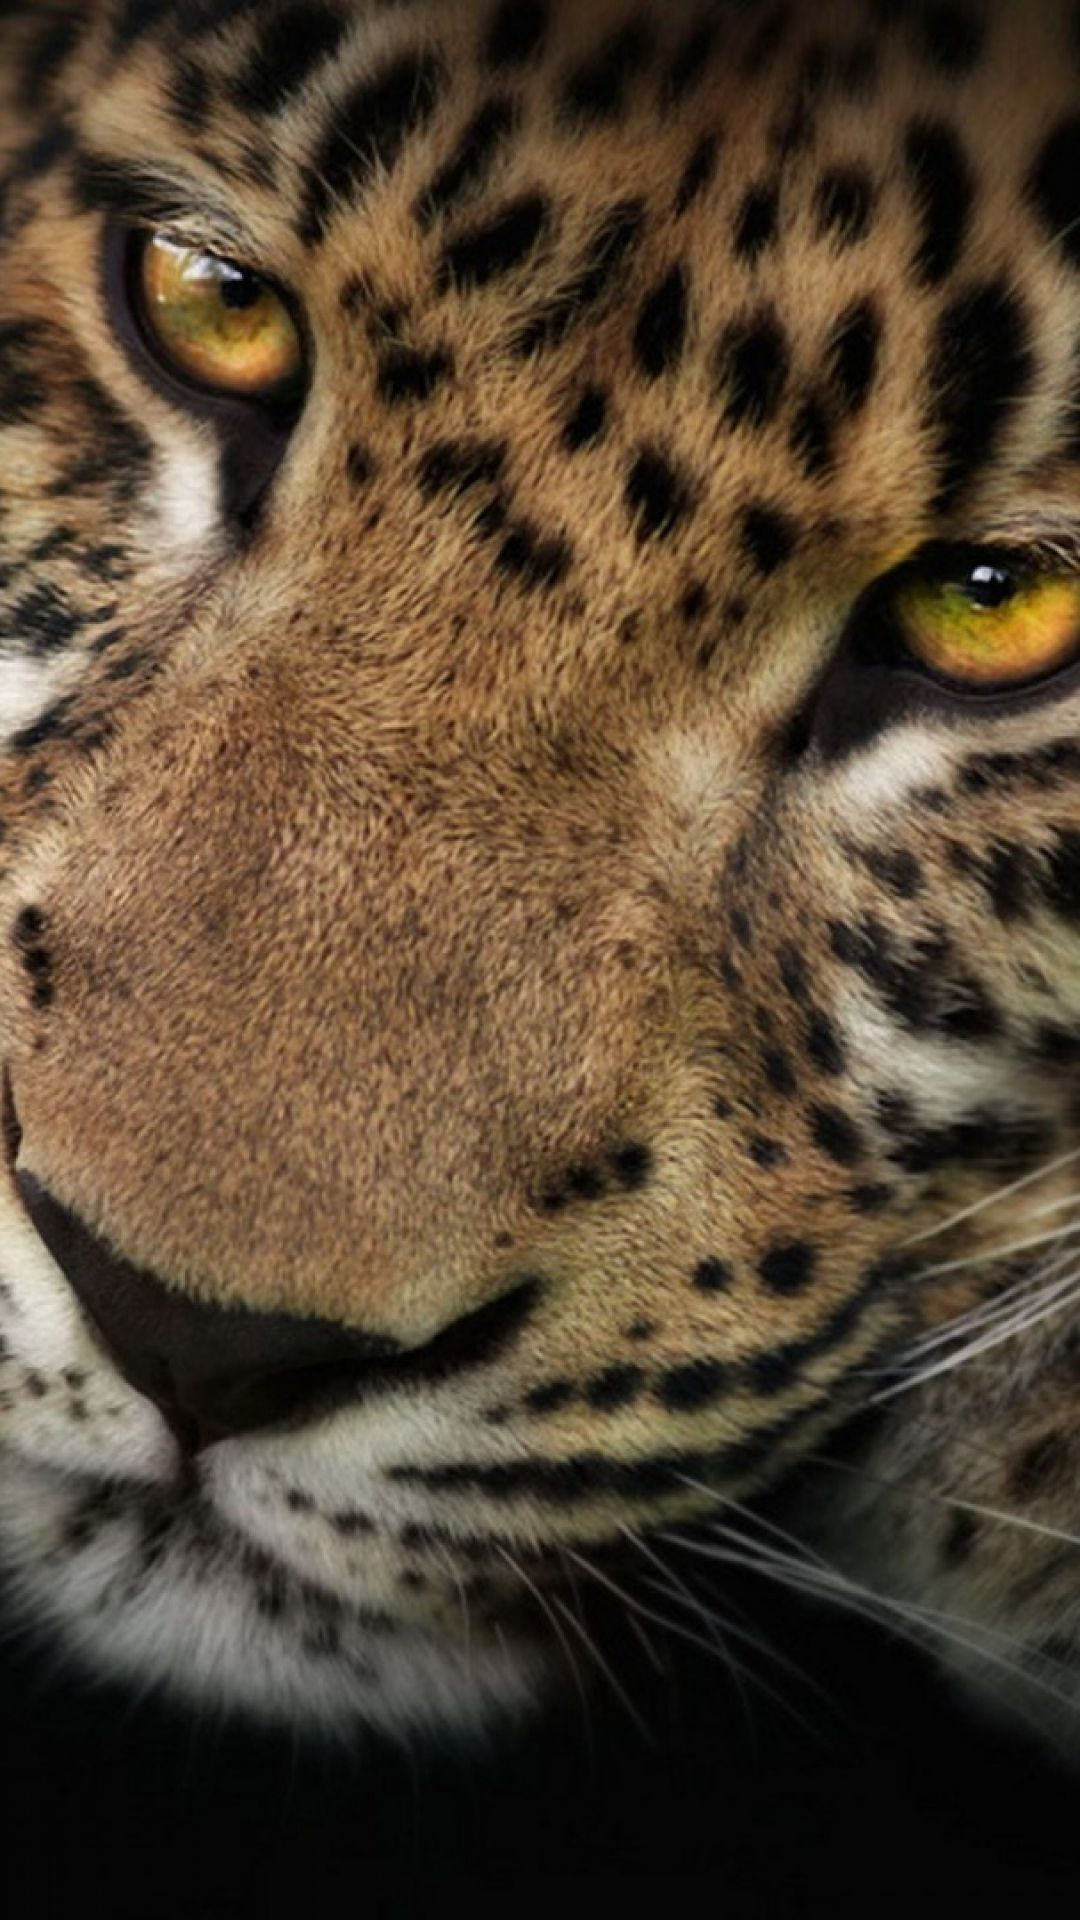 Animal iphone wallpaper tumblr -  Iphone Ios 7 Wallpaper Tumblr For Ipad